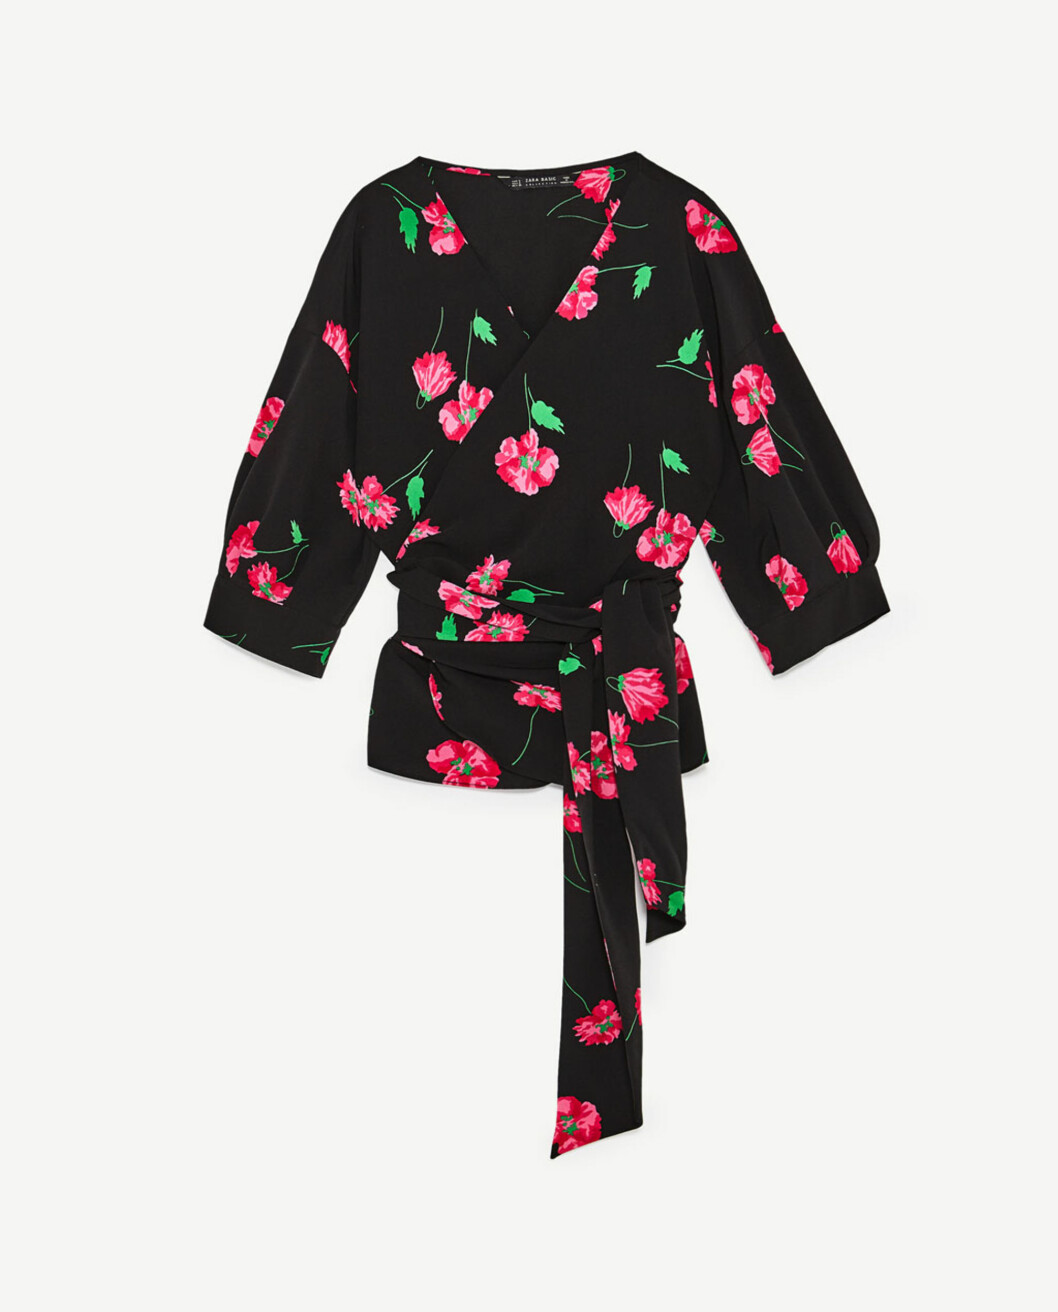 <strong>Omslagsskjorte fra Zara | kr 299 | https:</strong>//www.zara.com/no/no/dame/dress-time/omslagsskjorte-med-blomsterm%C3%B8nster-c943001p4763261.html